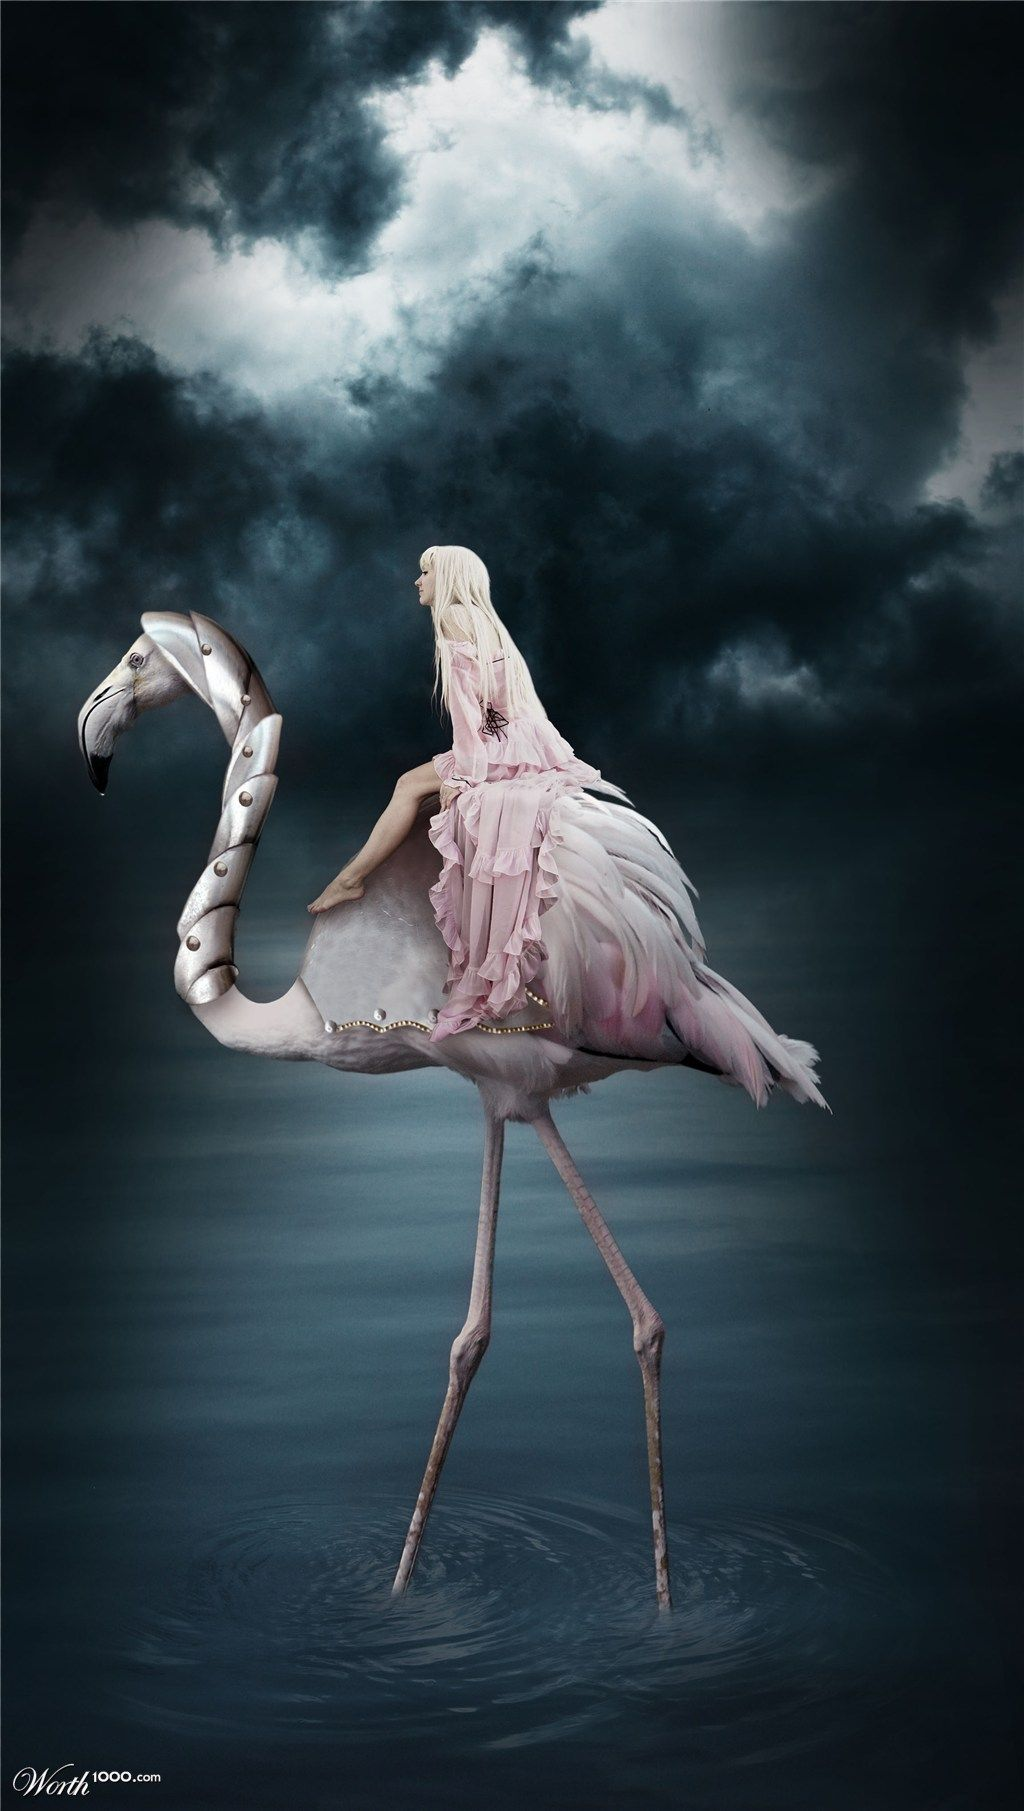 Flamingo Rider - Worth1000 Contests